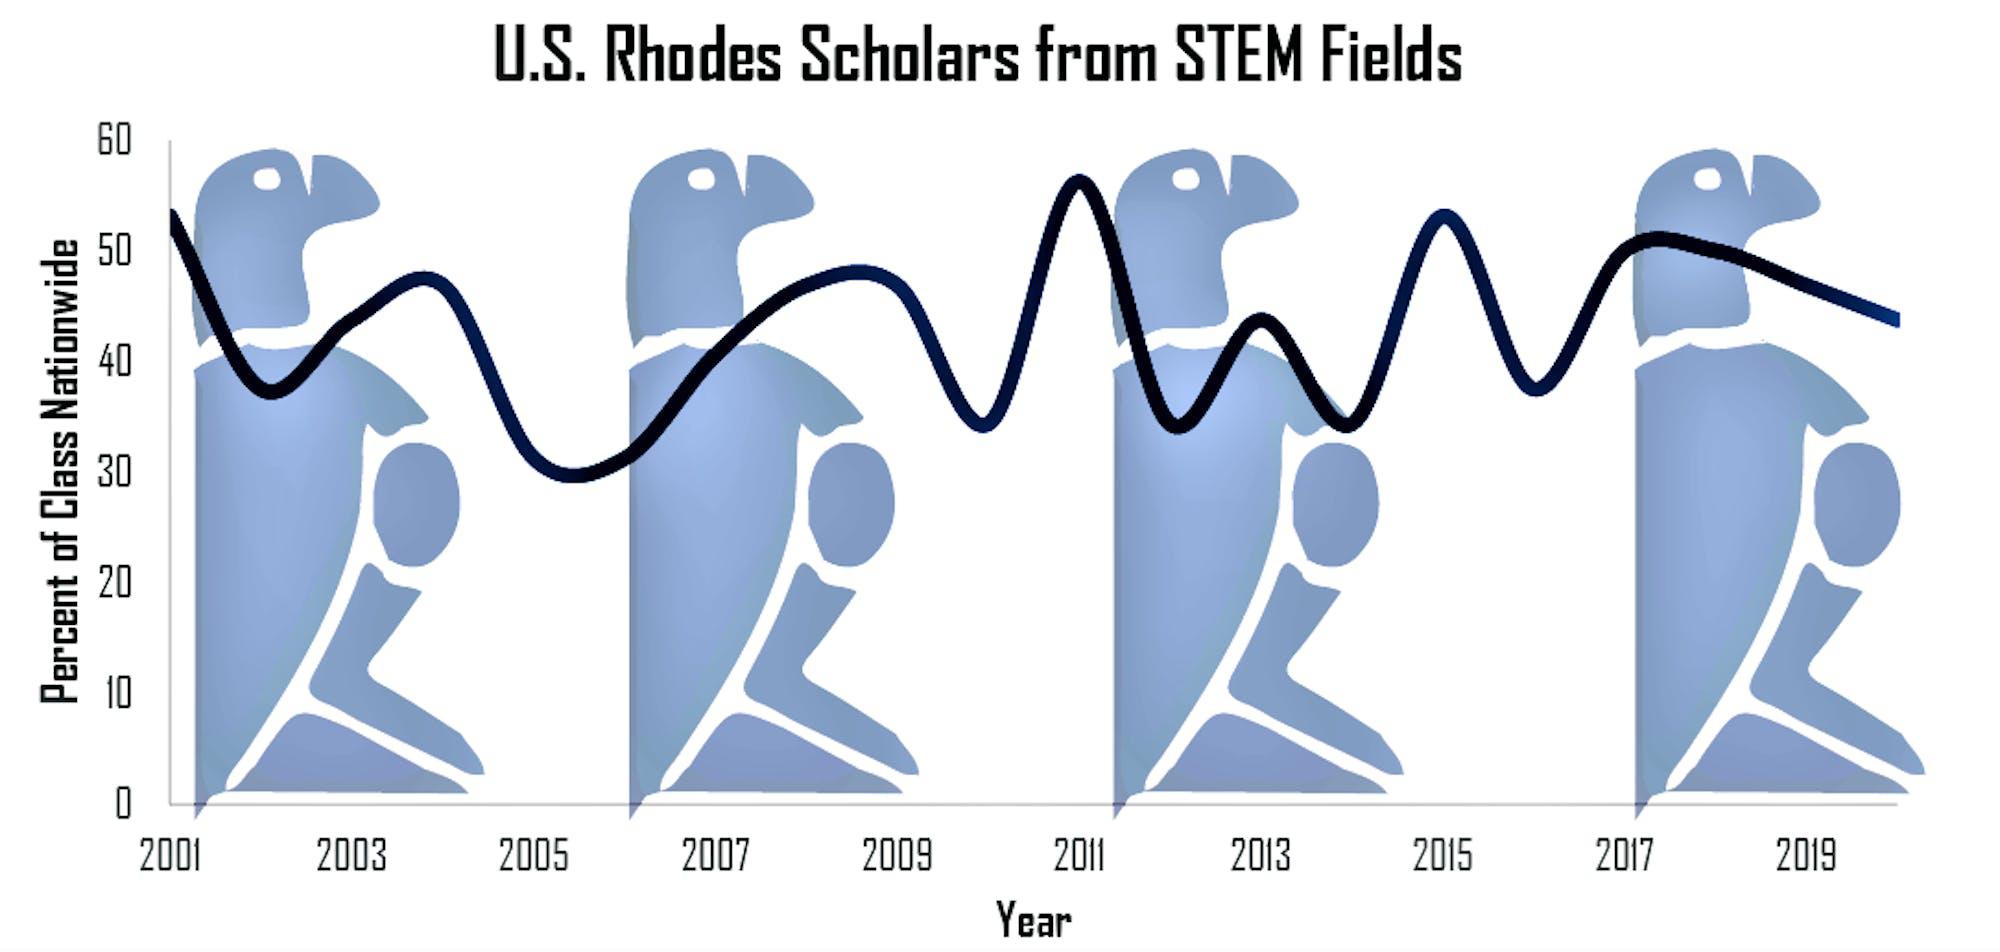 national-statistics-on-rhodes-scholars-from-stem-fields